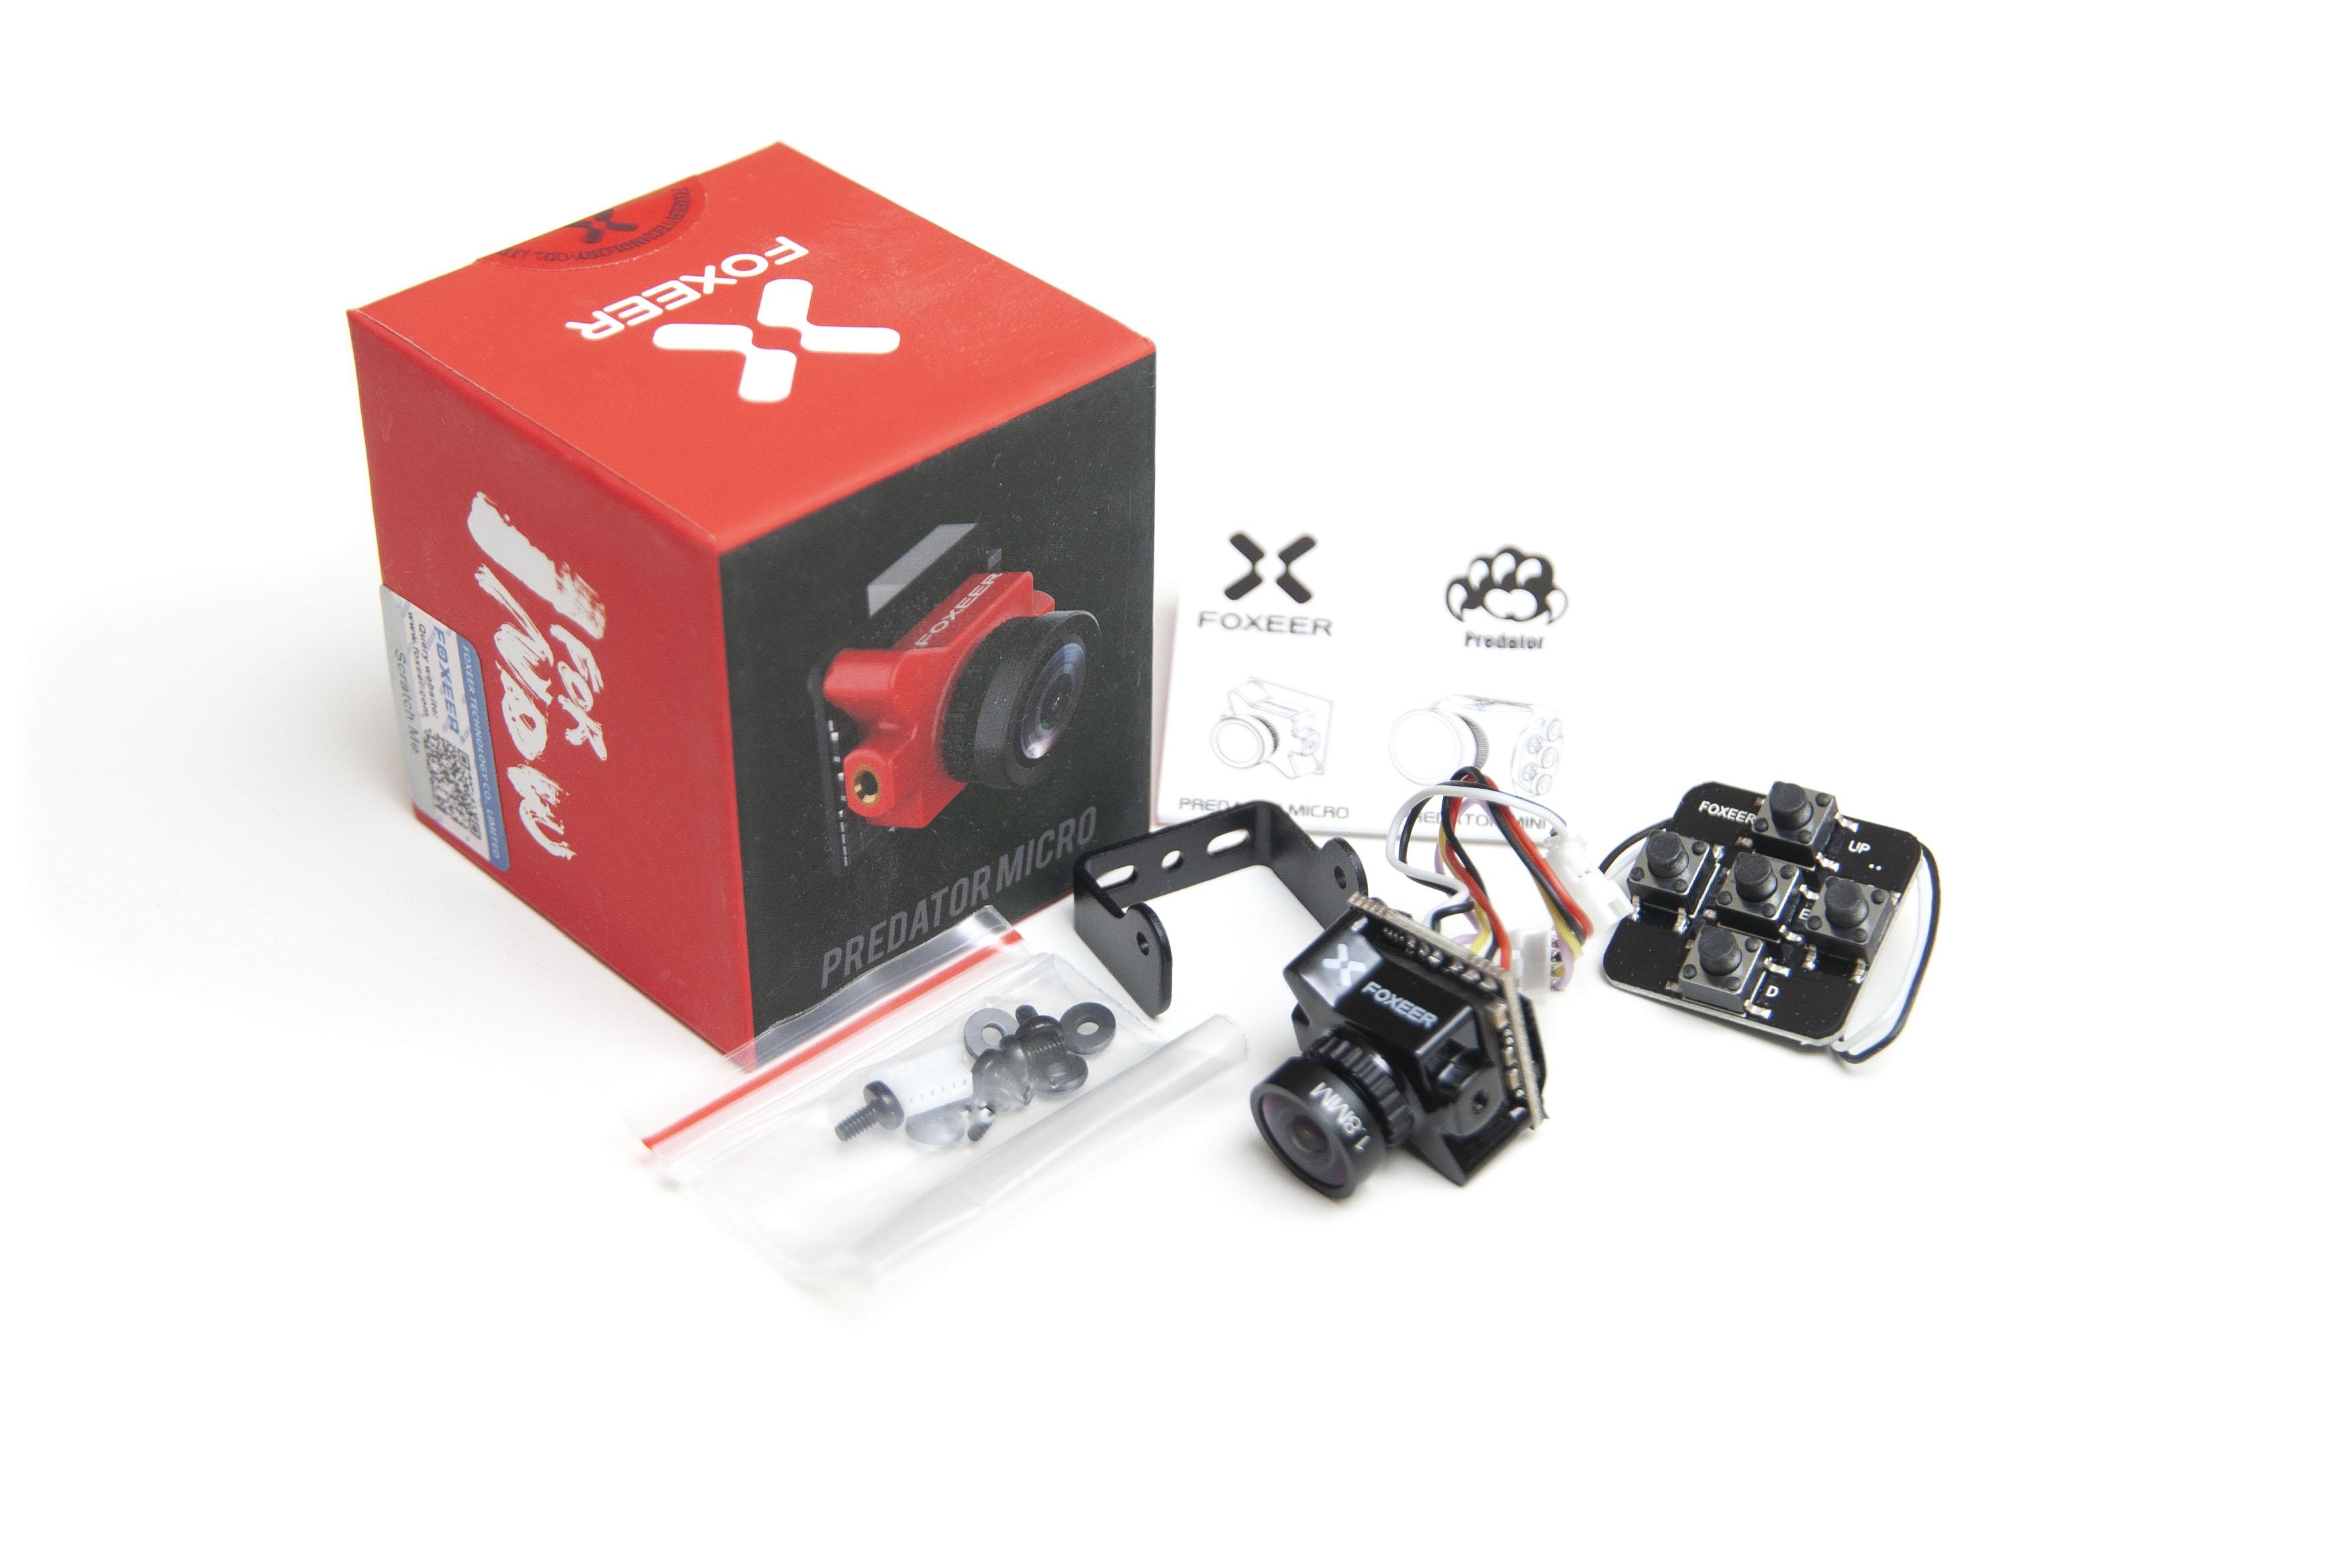 Foxeer Predator Micro V4 - Box